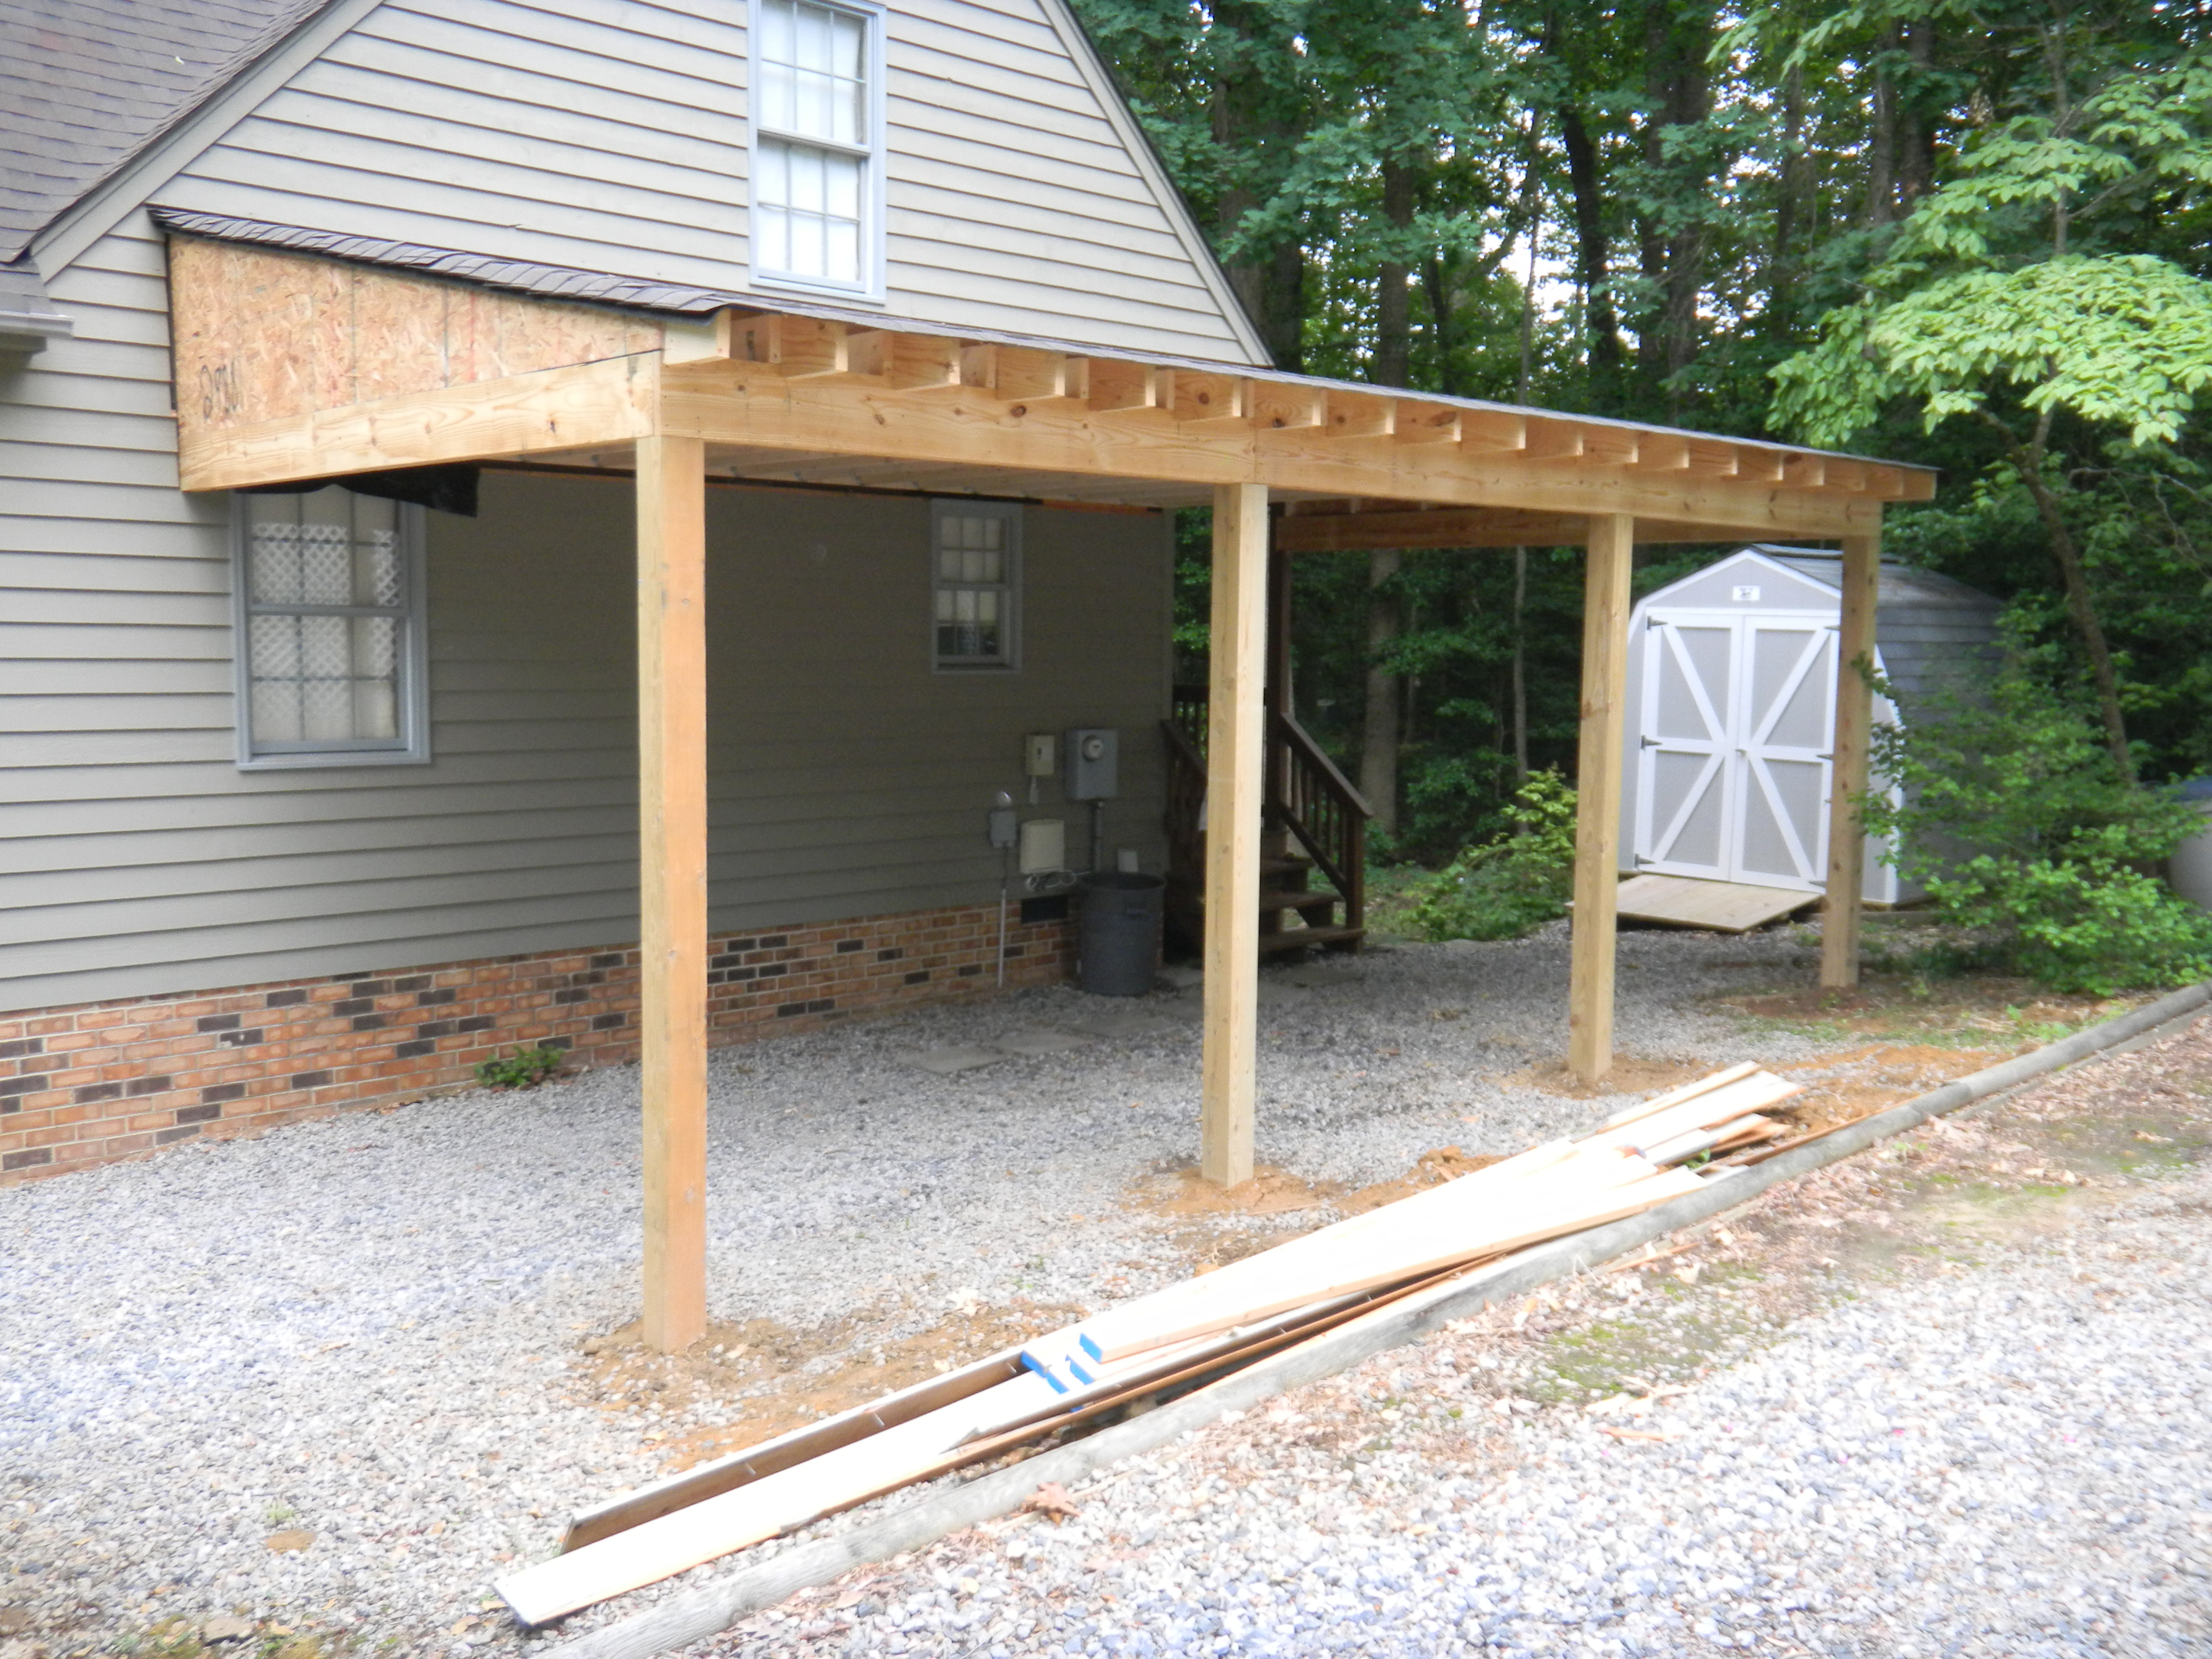 Carport - RBM Remodeling Solutions, LLC